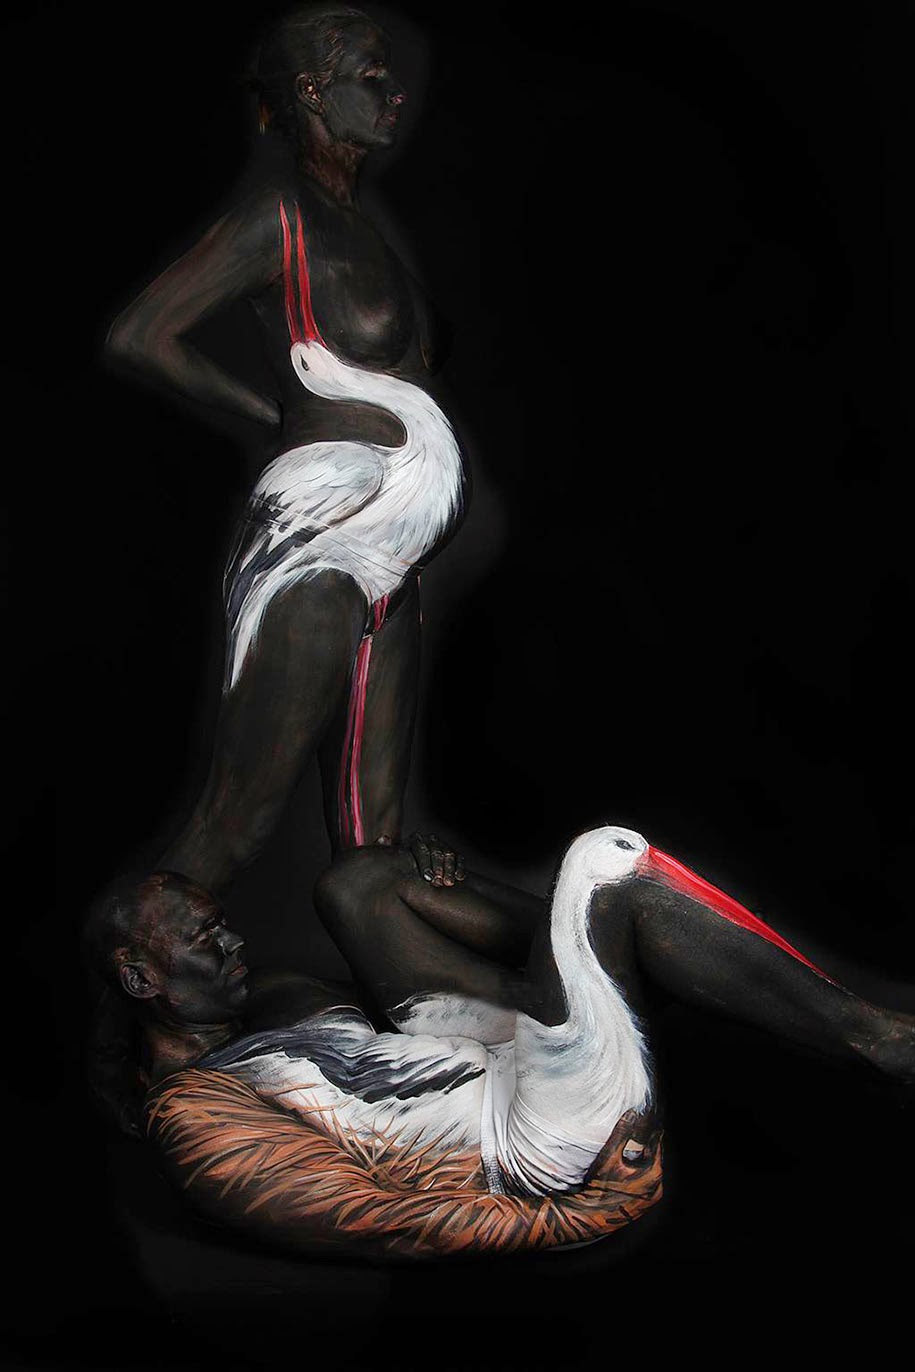 Lukisan Tubuh Manusia Merubah Orang Menjadi ANGSA